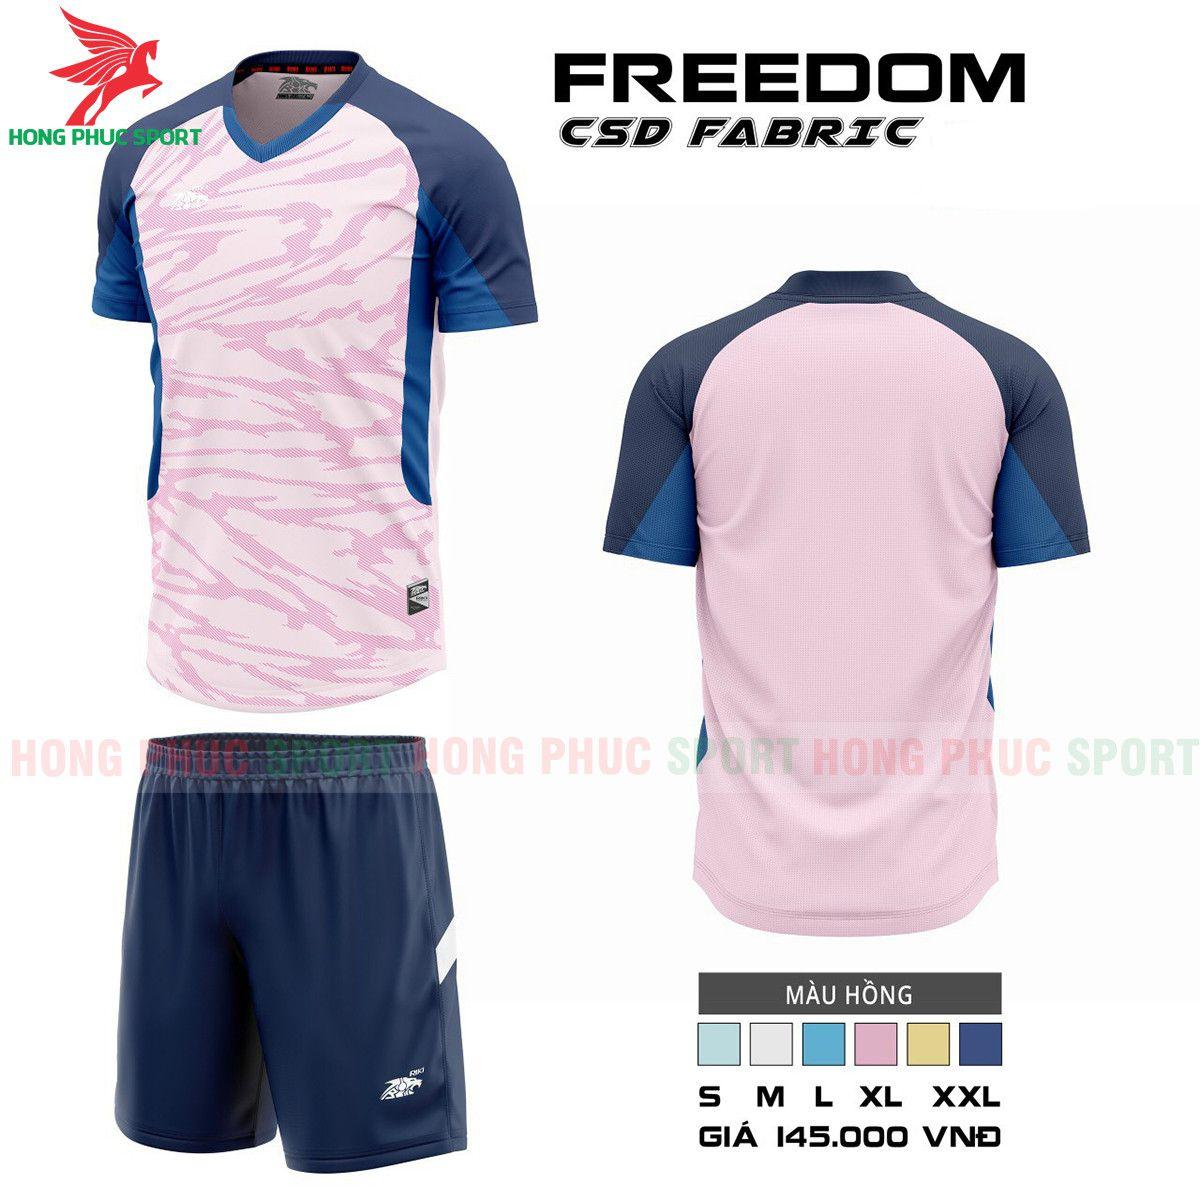 https://cdn.hongphucsport.com/unsafe/s4.shopbay.vn/files/285/ao-khong-logo-riki-freedom-2021-mau-hong-1-6156830e6bce8.jpg